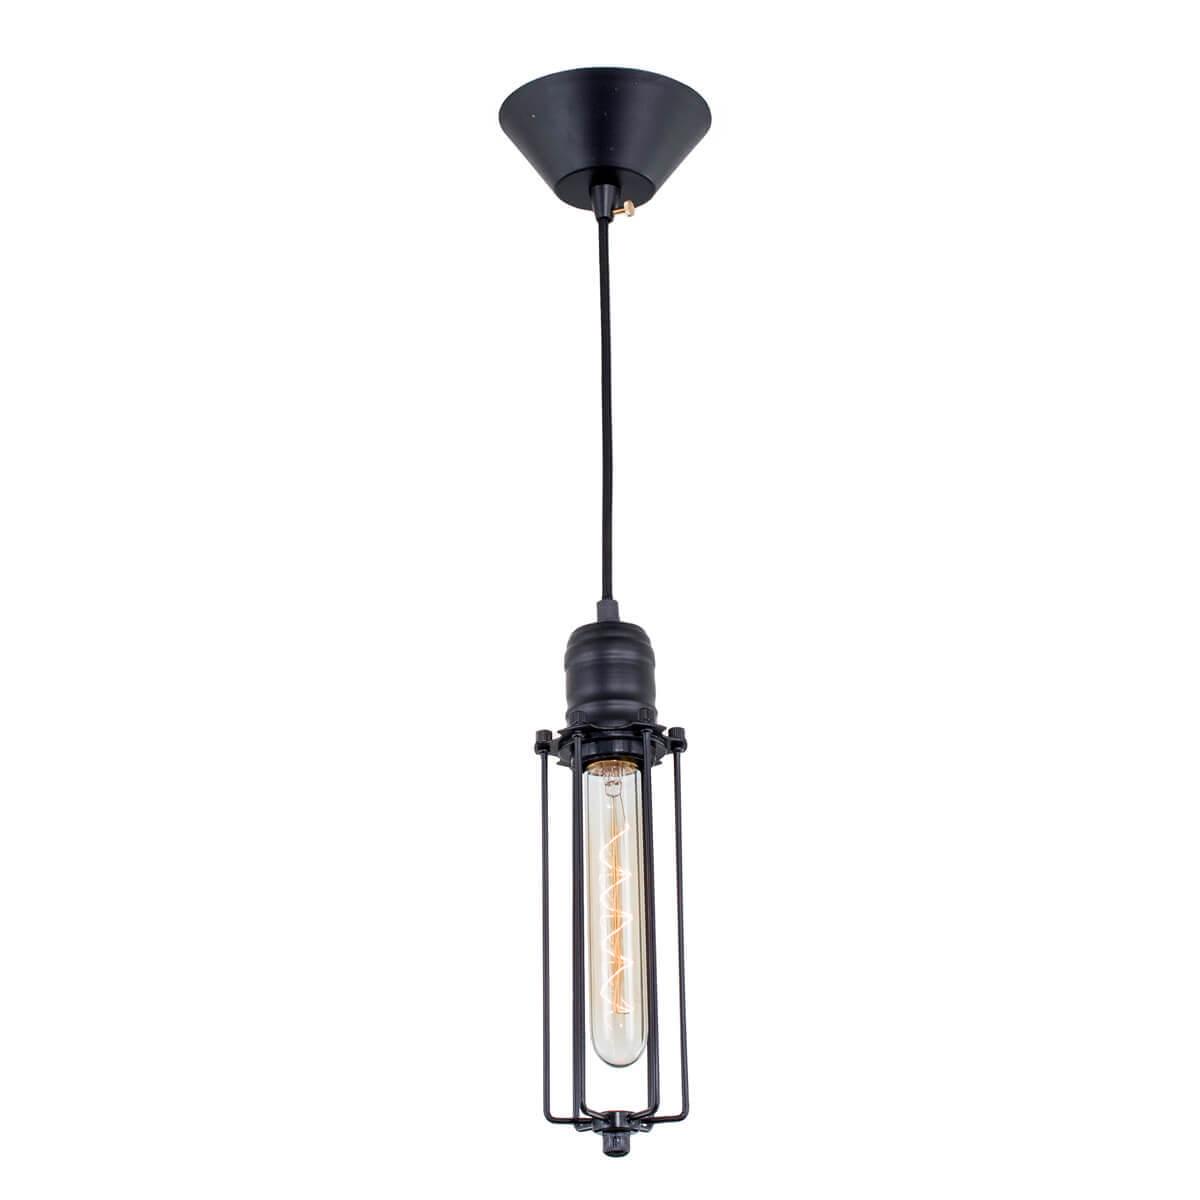 цена на Светильник Citilux CL450202 Эдисон